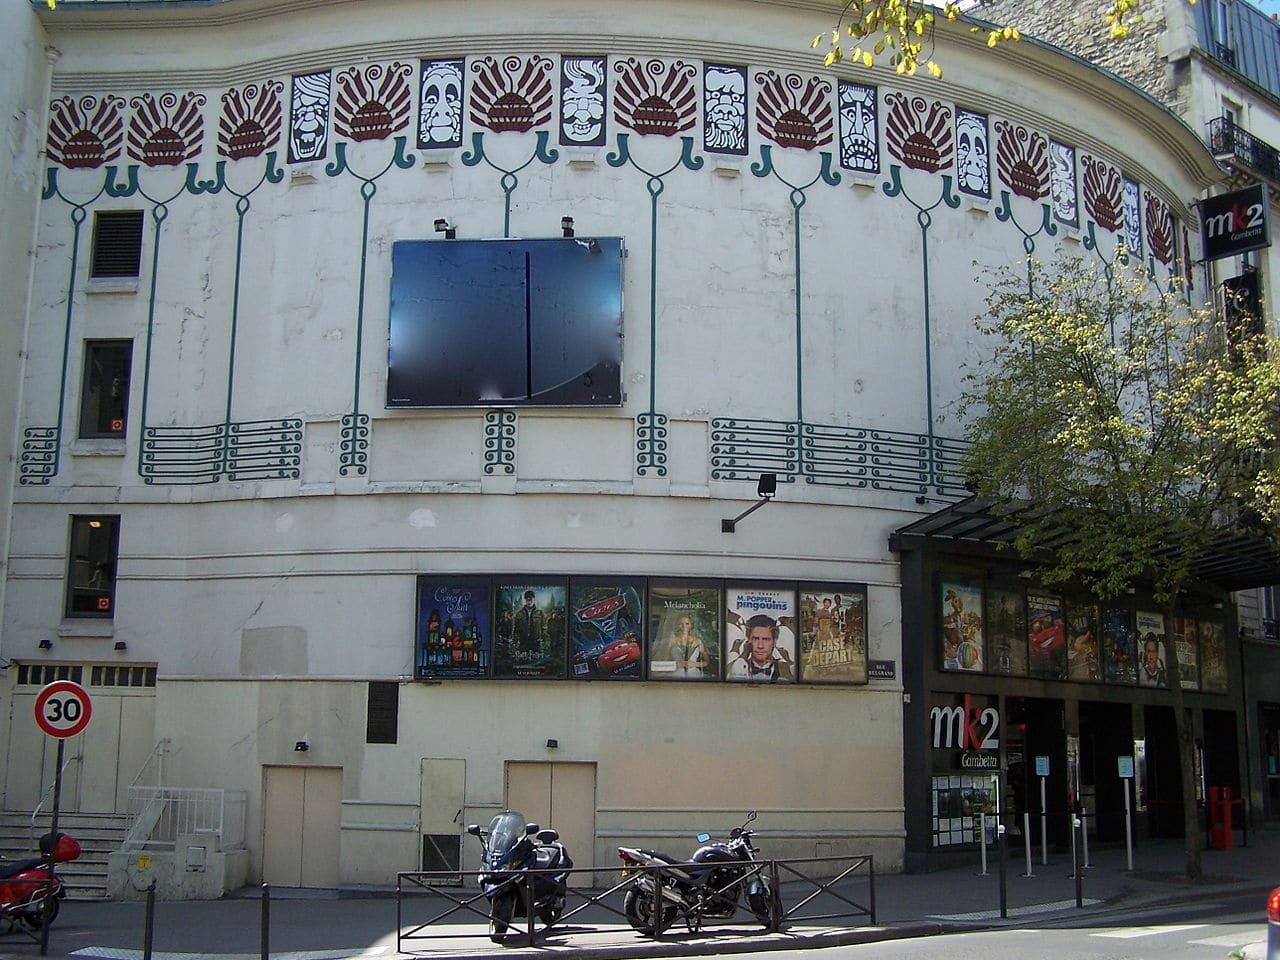 cinéma MK2_Gambetta paris art déco henri sauvage